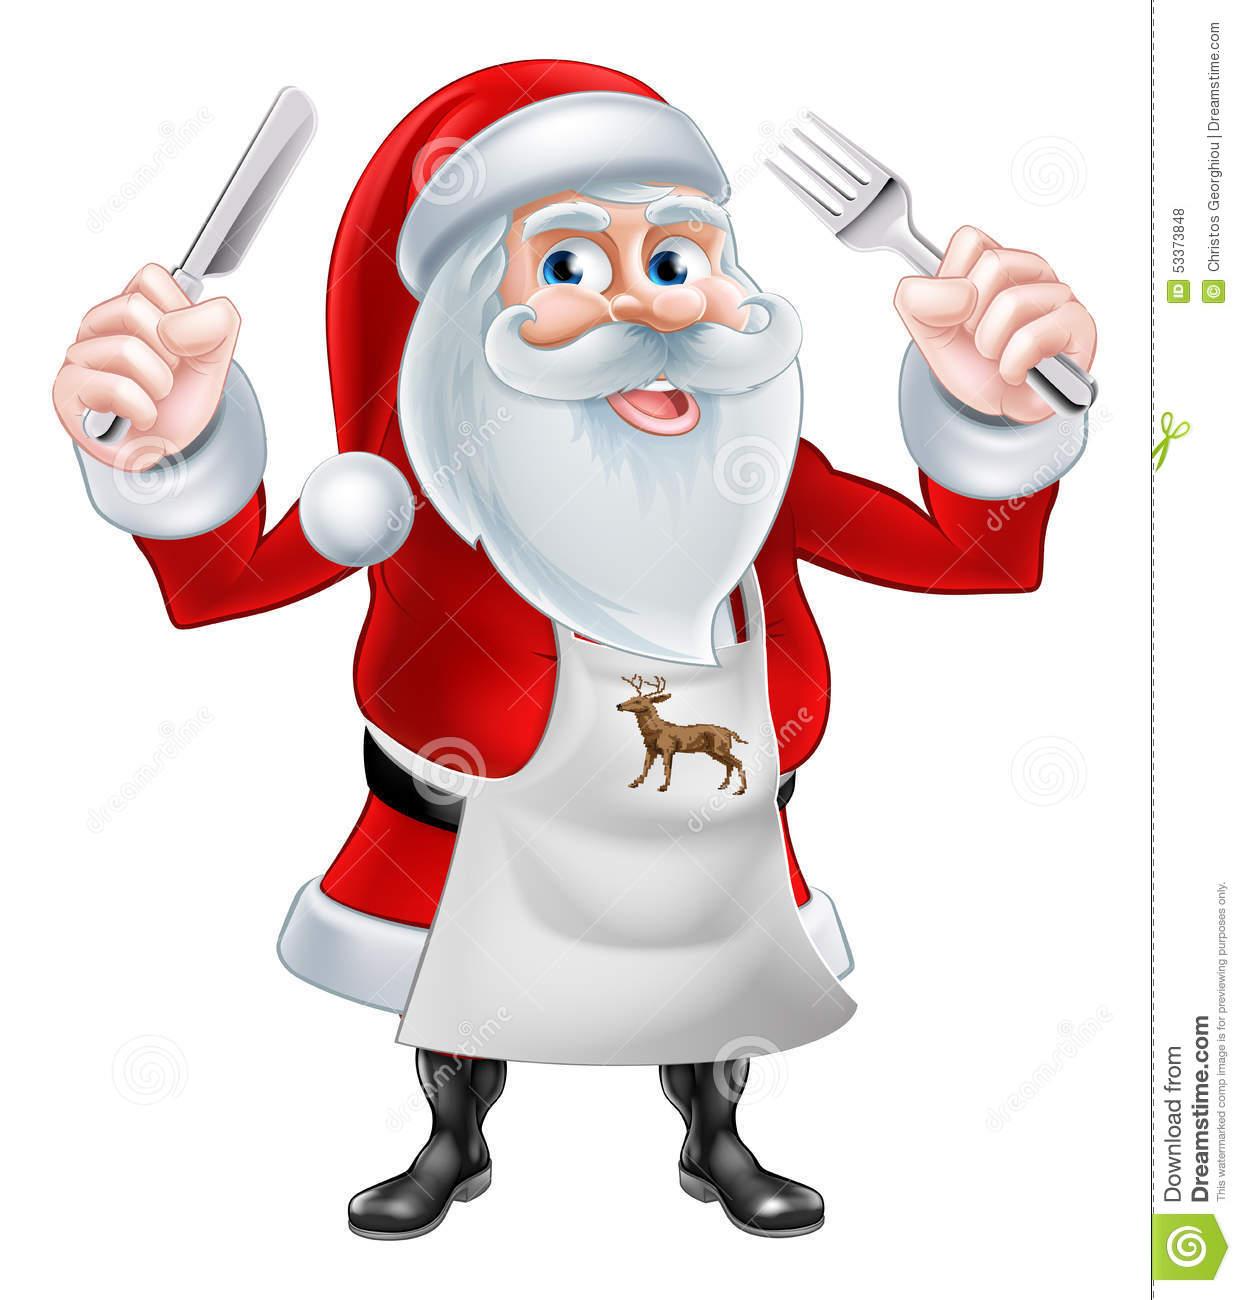 Santa Cook Christmas Dinner Concept Stock Photo.